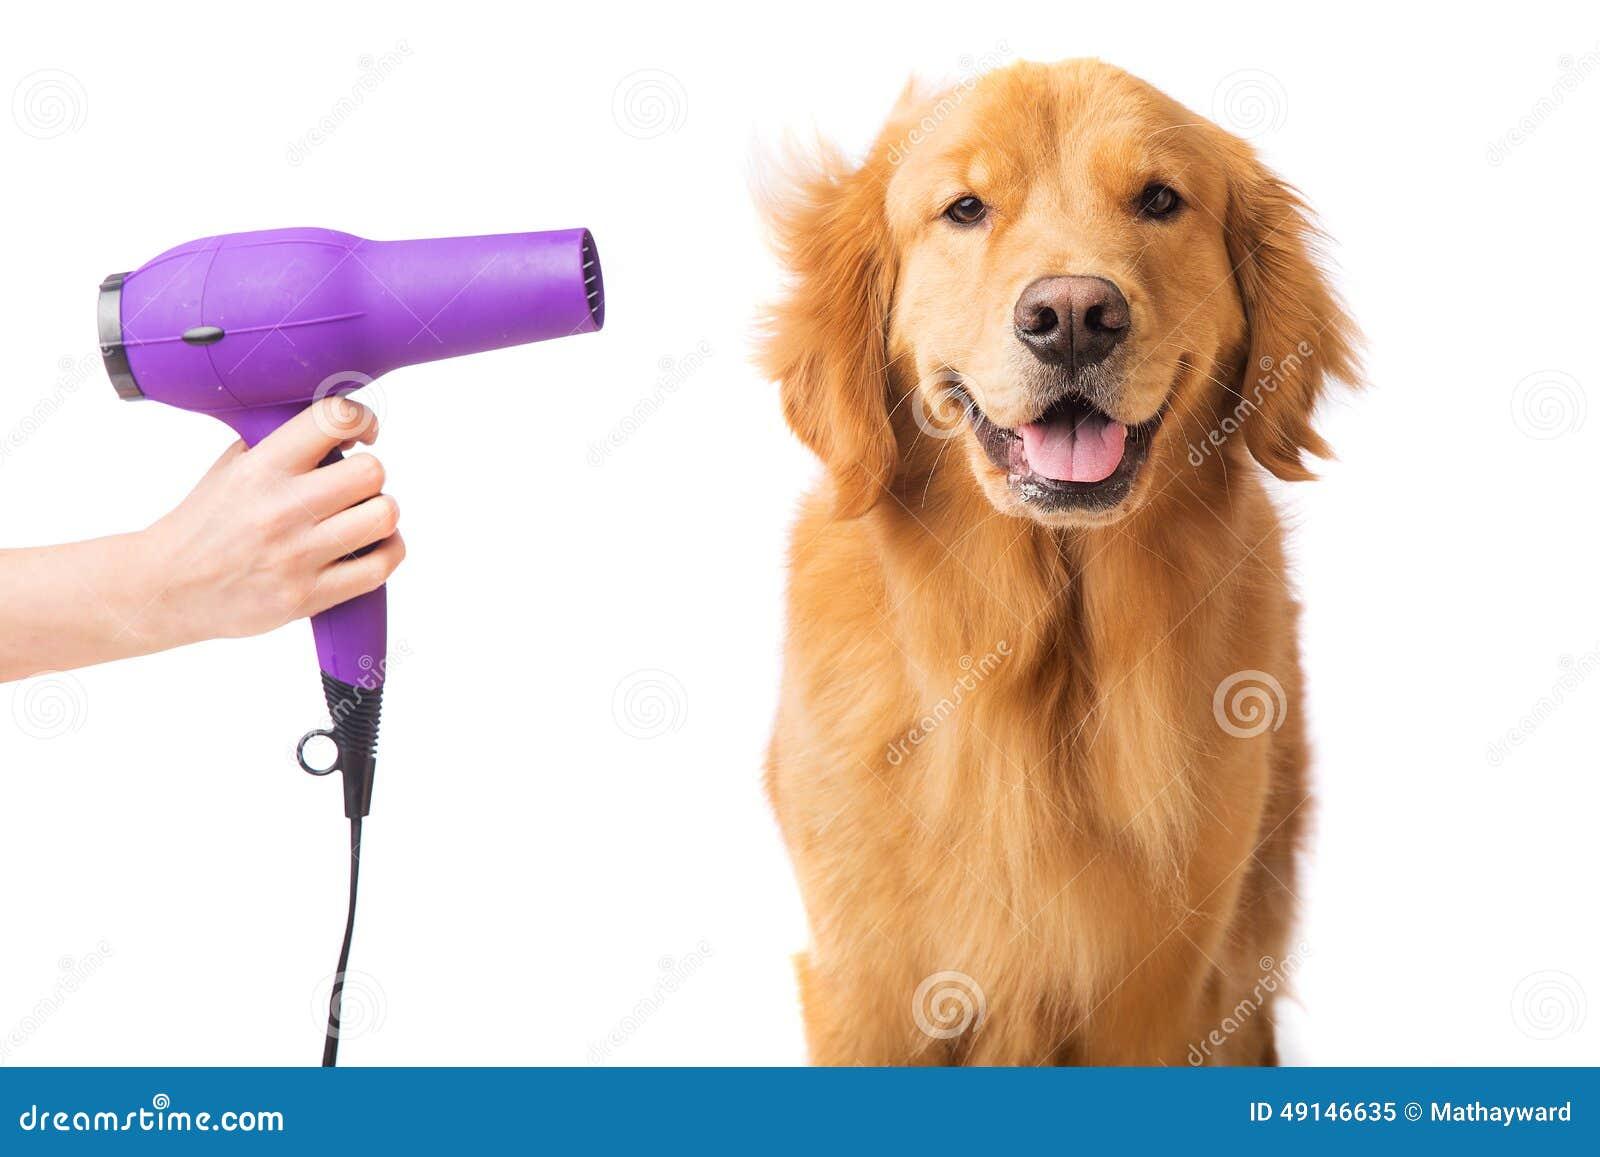 Happy Dog At The Groomer Stock Photo - Image: 49146635 - photo#15